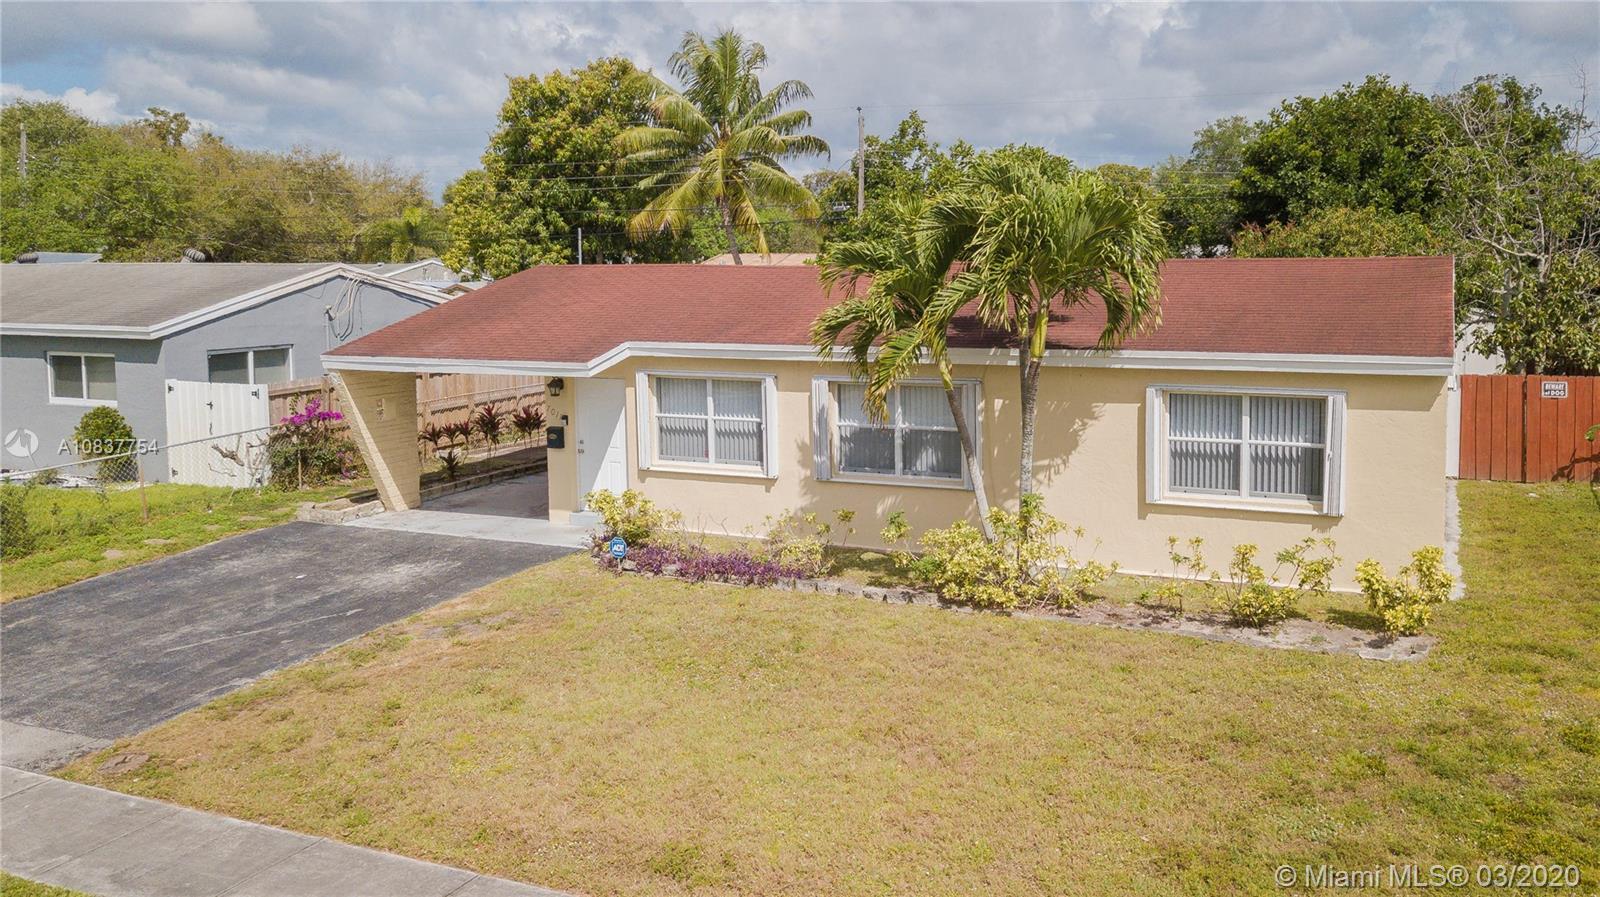 7011 Scott St, Hollywood, FL 33024 - Hollywood, FL real estate listing